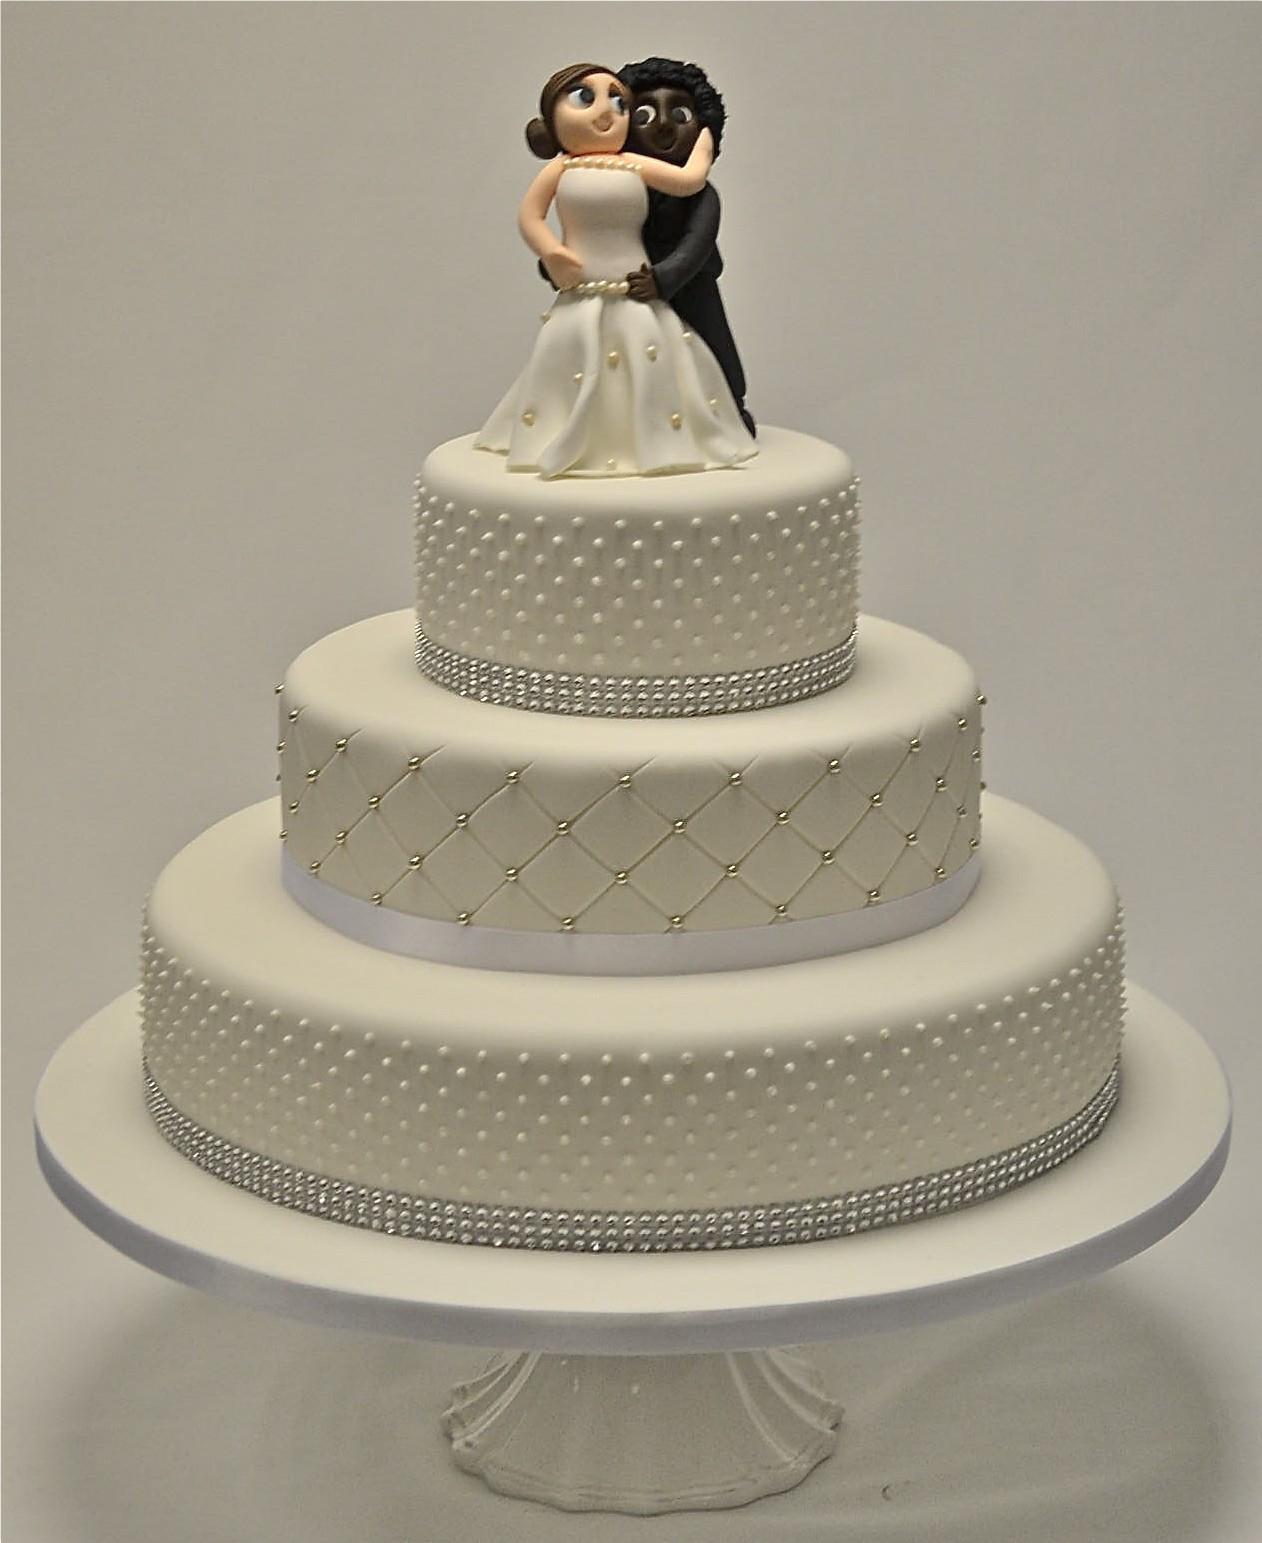 Three Tear Wedding Cakes  3 Tier Piped Dots and Diamante Wedding Cake Wedding